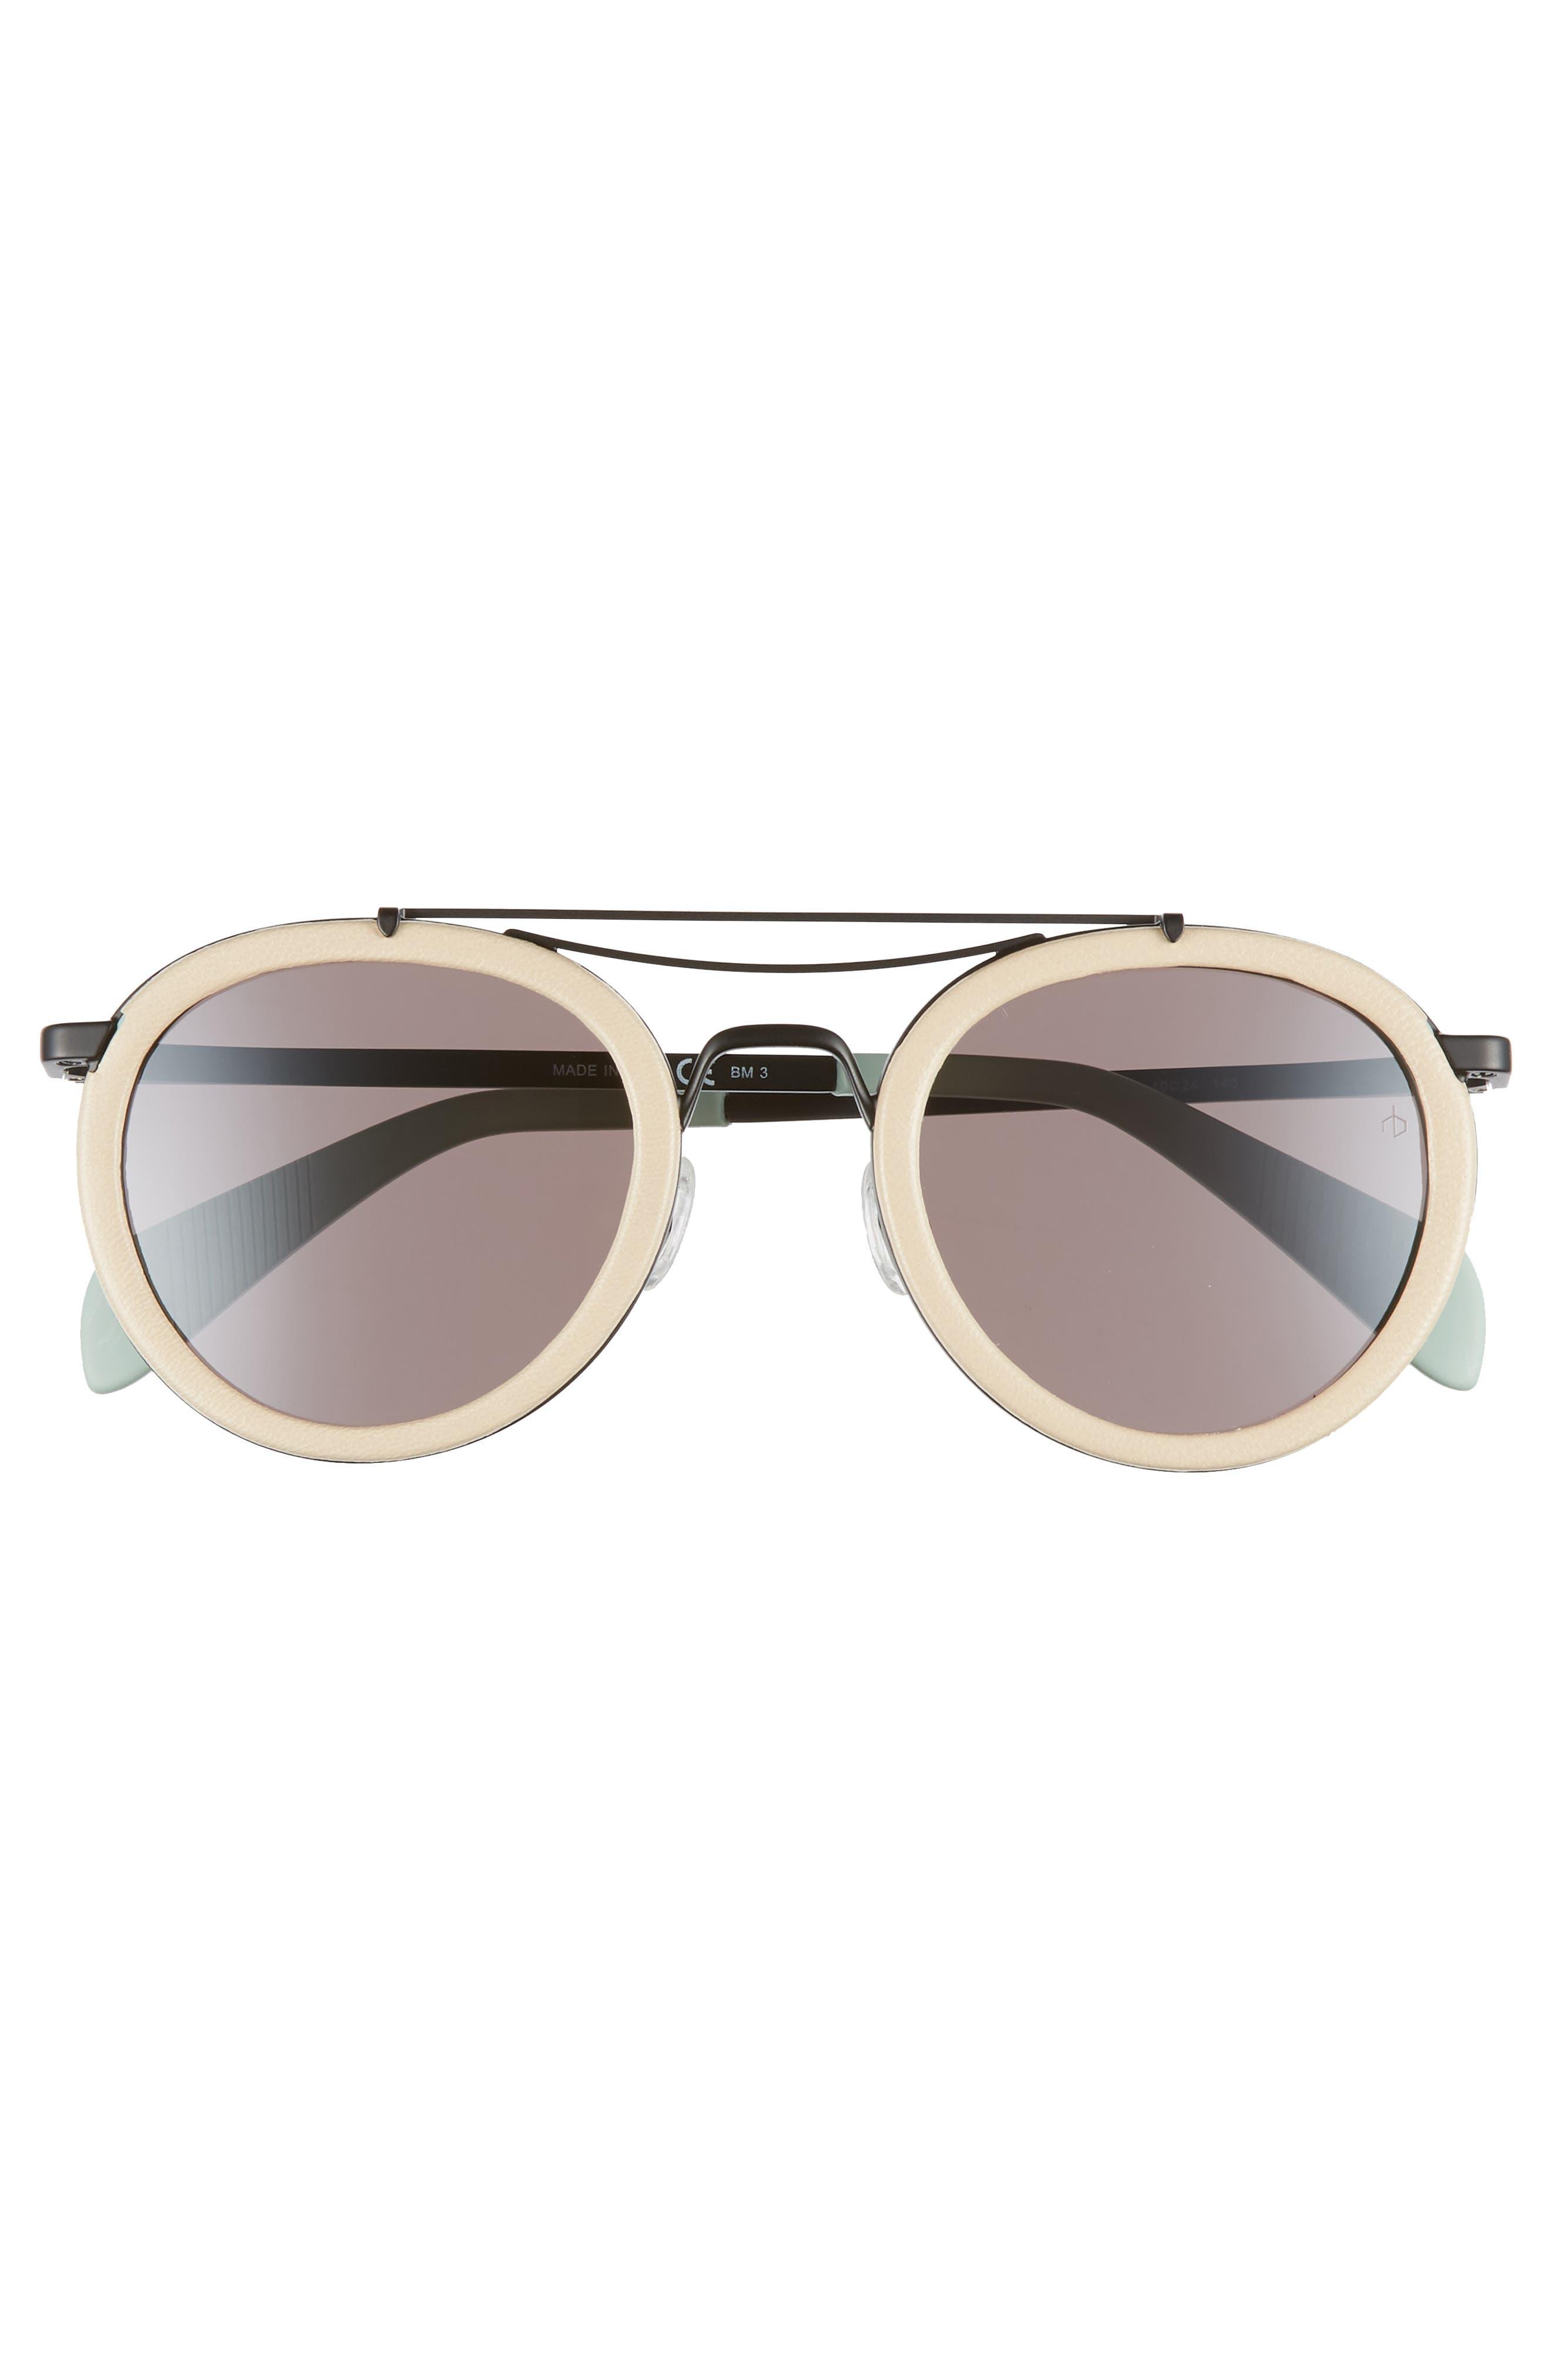 55mm Round Aviator Sunglasses,                             Alternate thumbnail 3, color,                             MATTE BLACK BEIGE